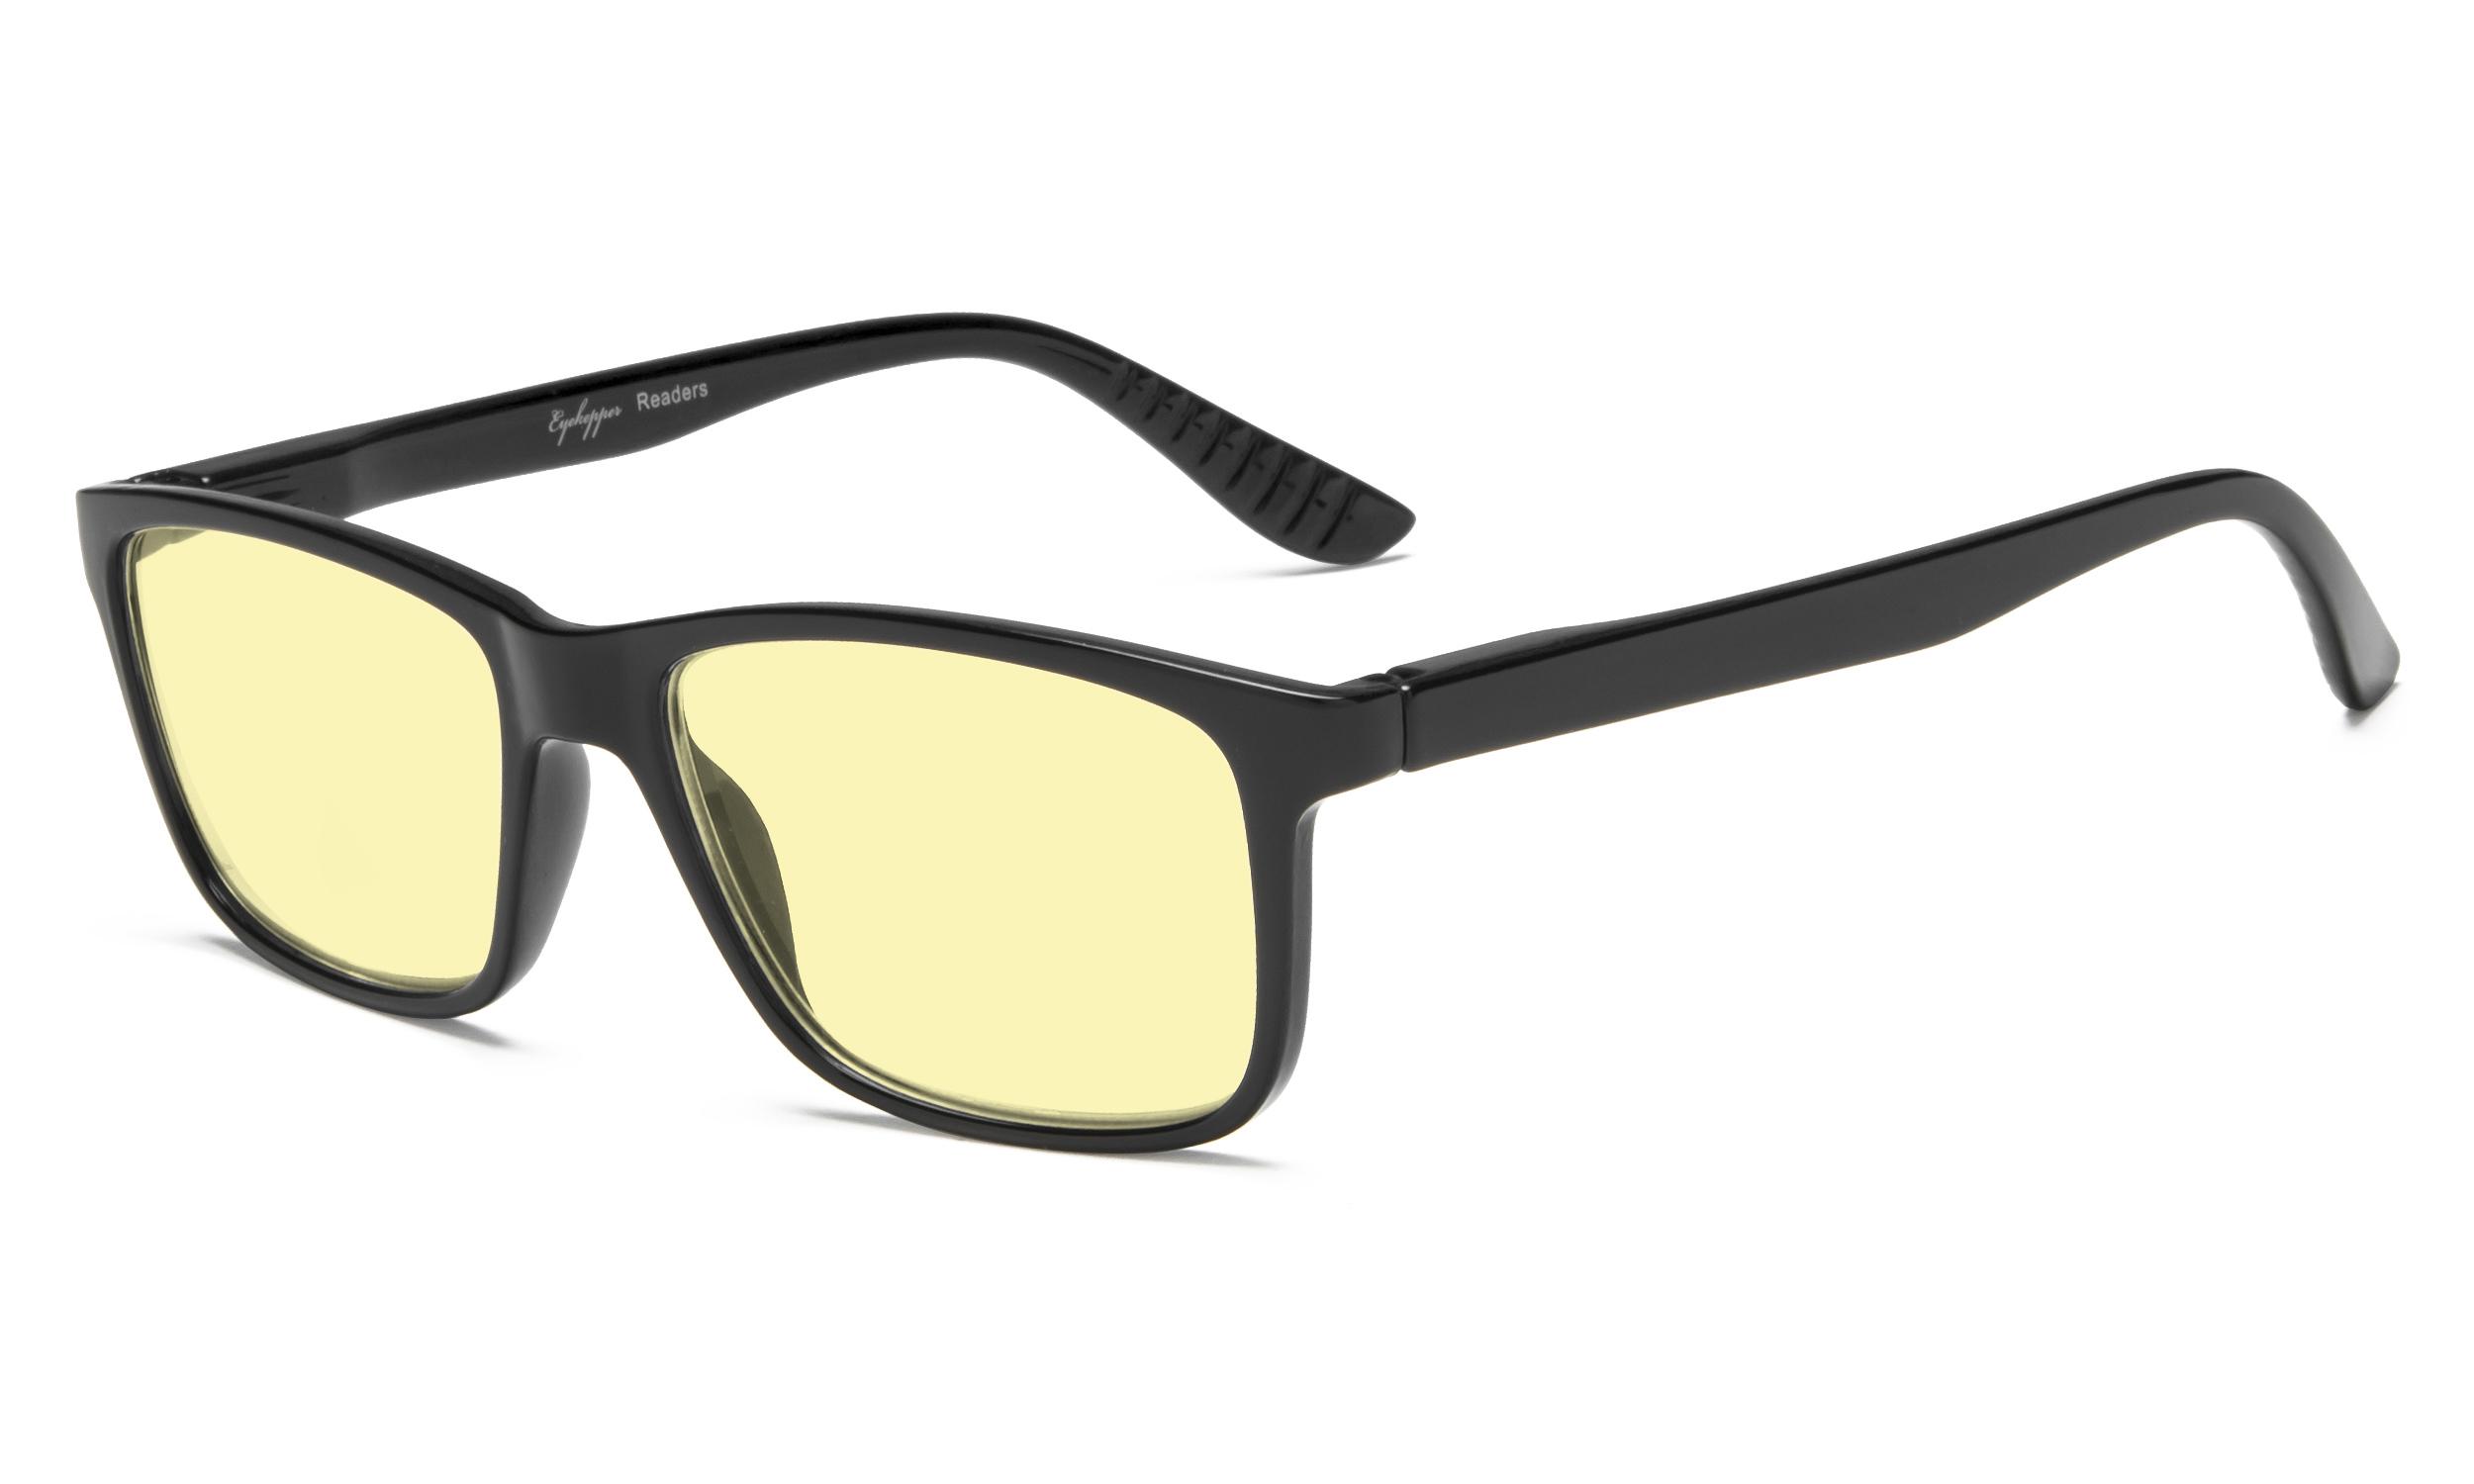 57f249d5380 Eyekepper Computer Reading Glasses Yellow Tinted Lens Blue Light Shield  TM163